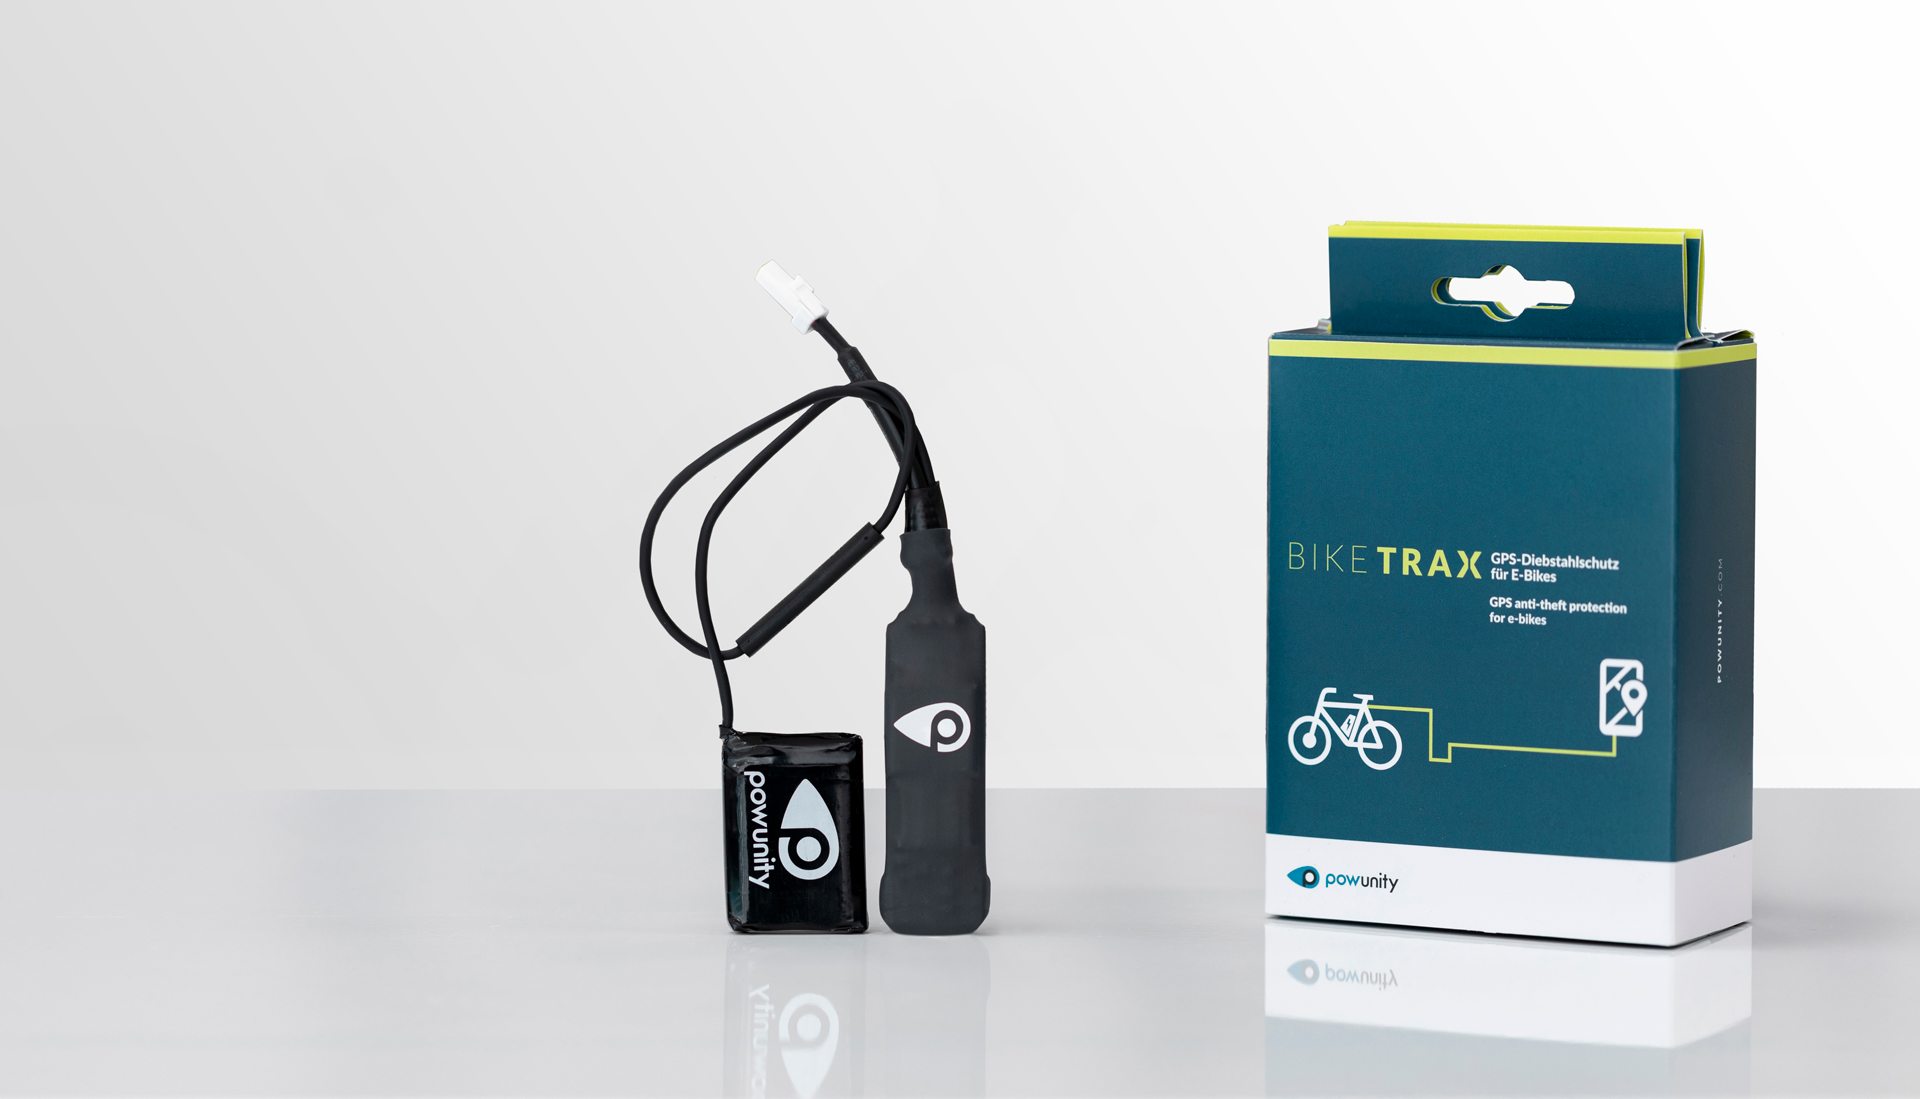 Yamaha E-Bike 용 GPS 트래커-BikeTrax GPS 트래커 전자 자전거-GPS ...